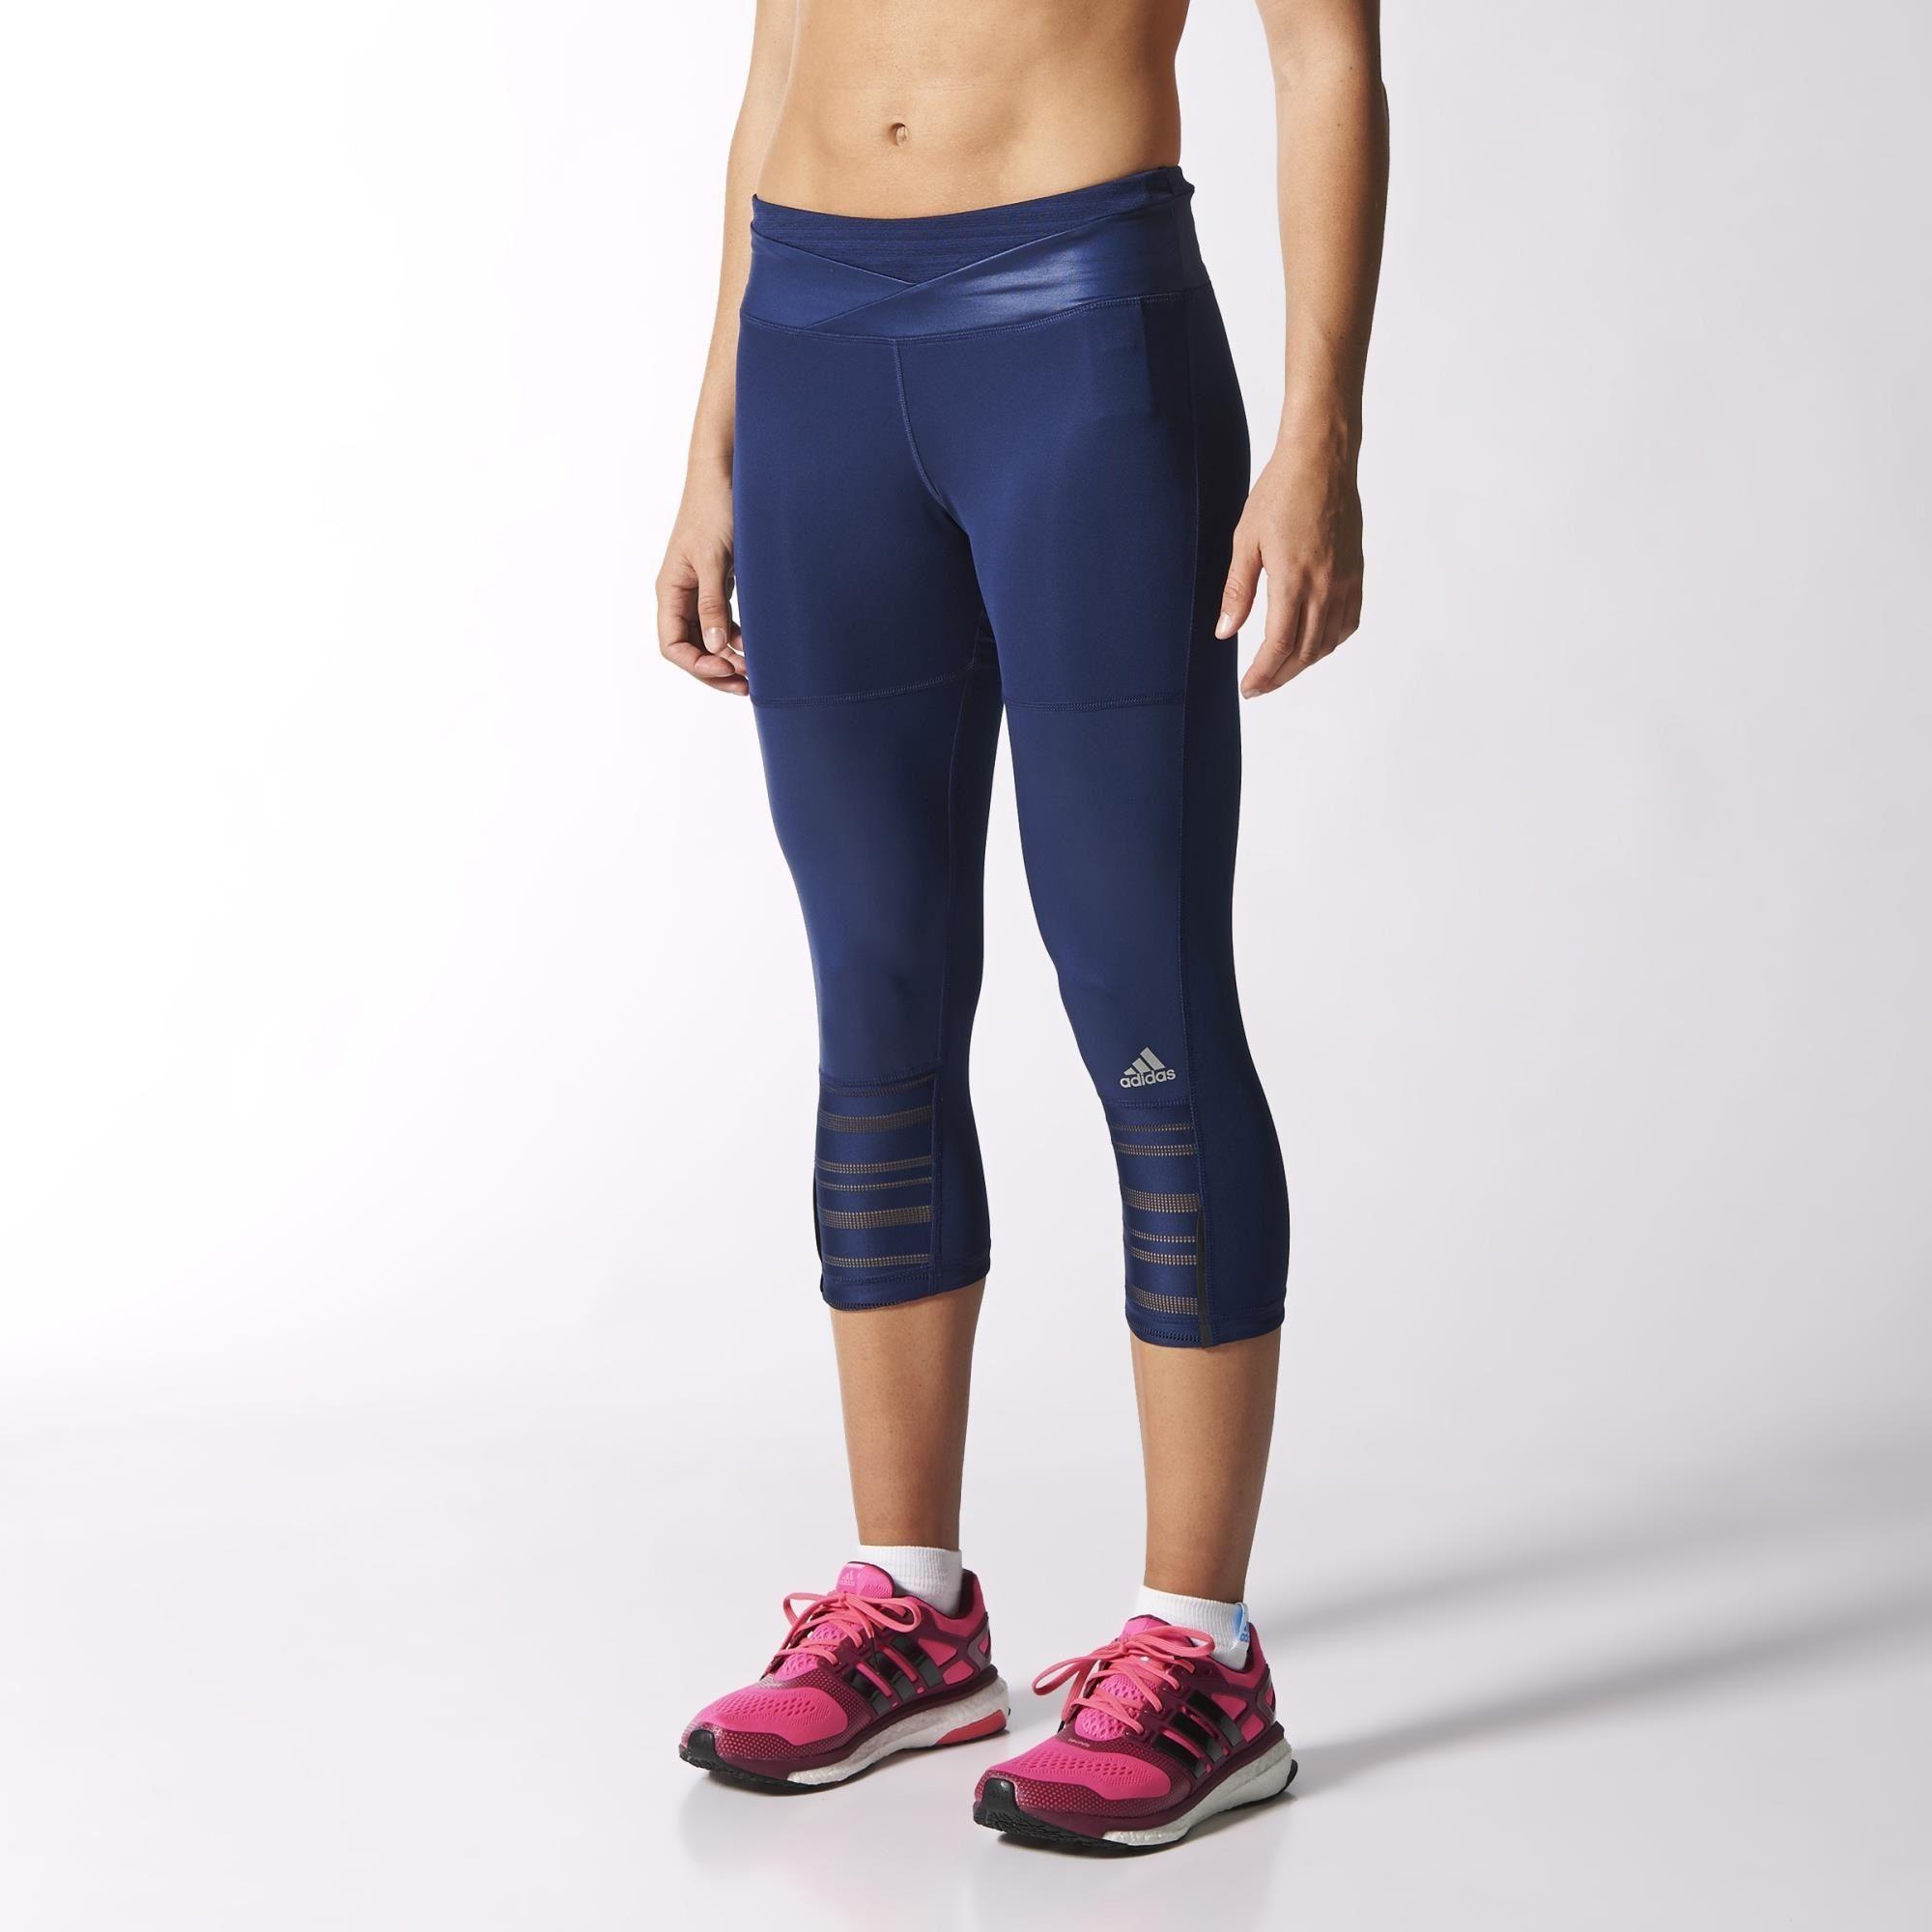 03c7b4b104b4d adidas - Supernova Three-Quarter Tights | Adidas gear | Adidas ...